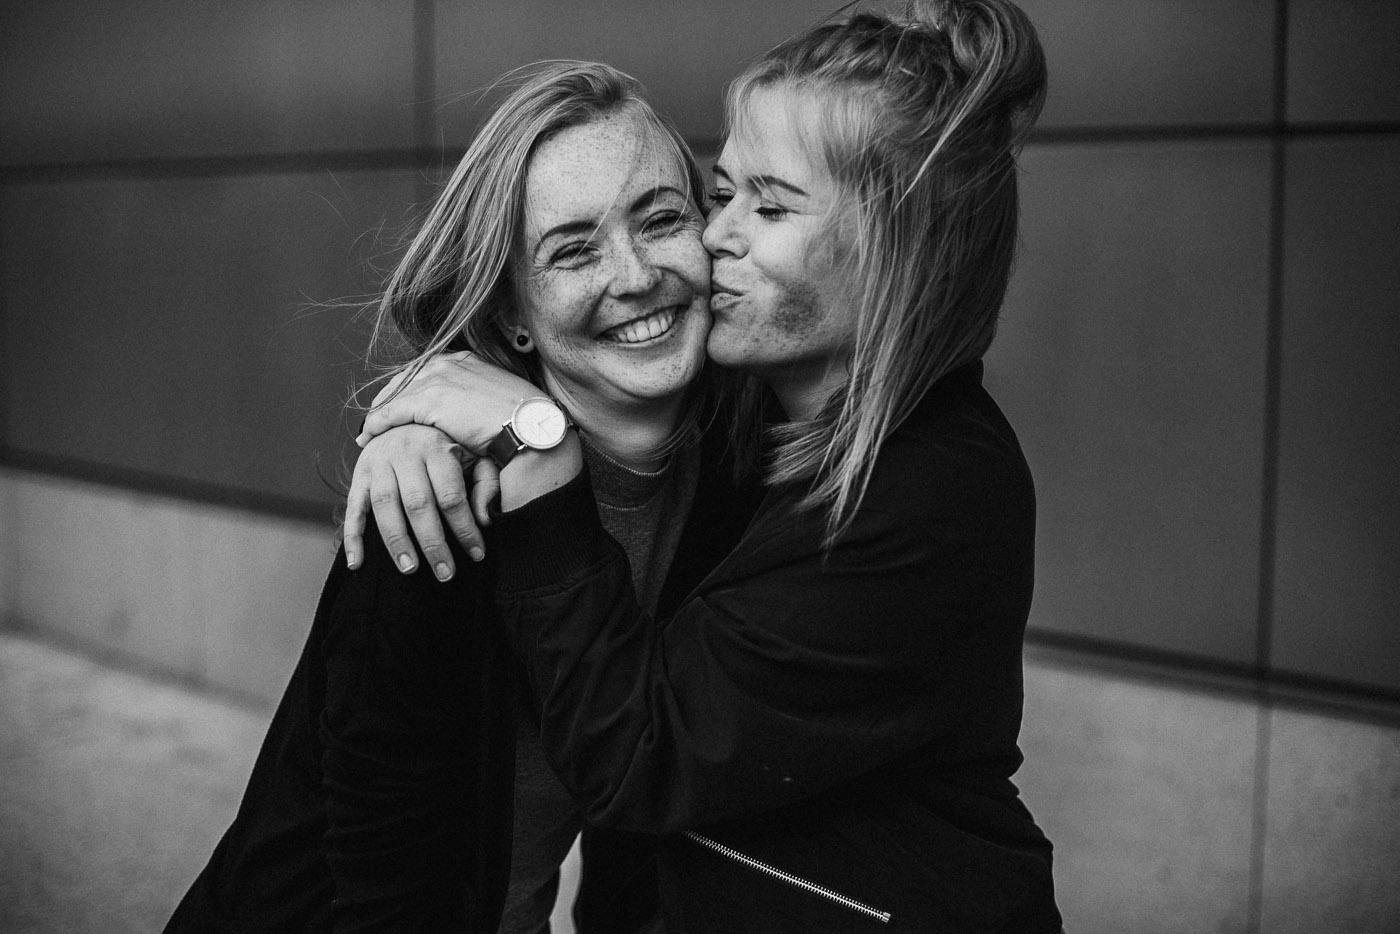 Sophie&Christina_UlrichSperlWeddings_18.jpg.jpg